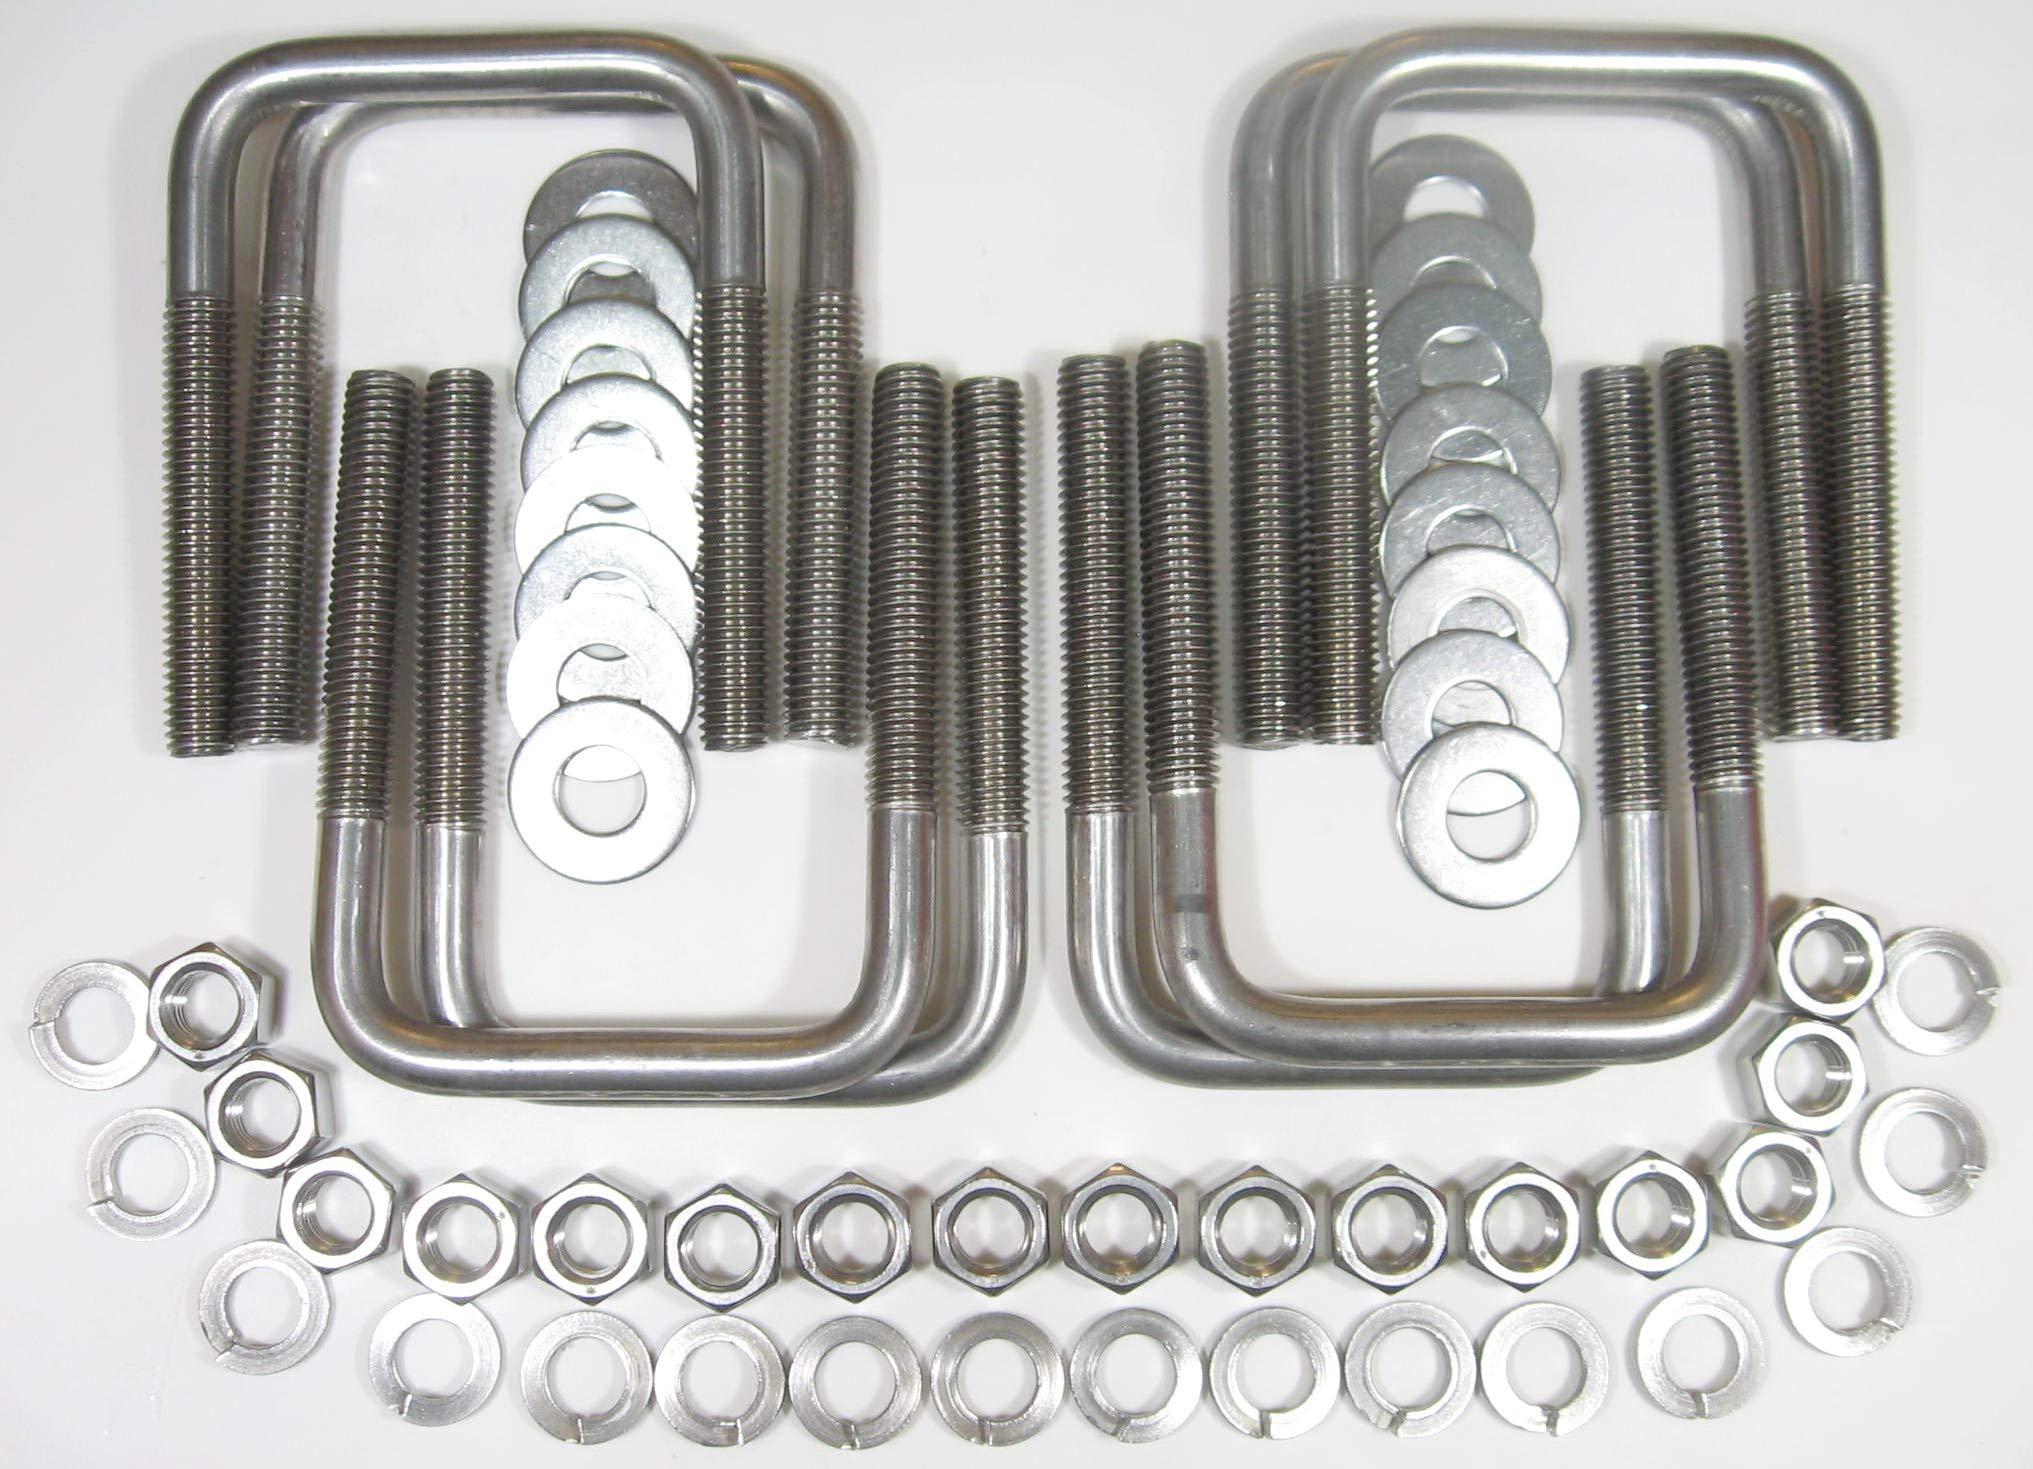 (8) 304 Stainless Steel Square U-Bolt Boat Trailer U bolt Ubolt 1/2'' D x 3 1/16'' W x 4 5/16'' L